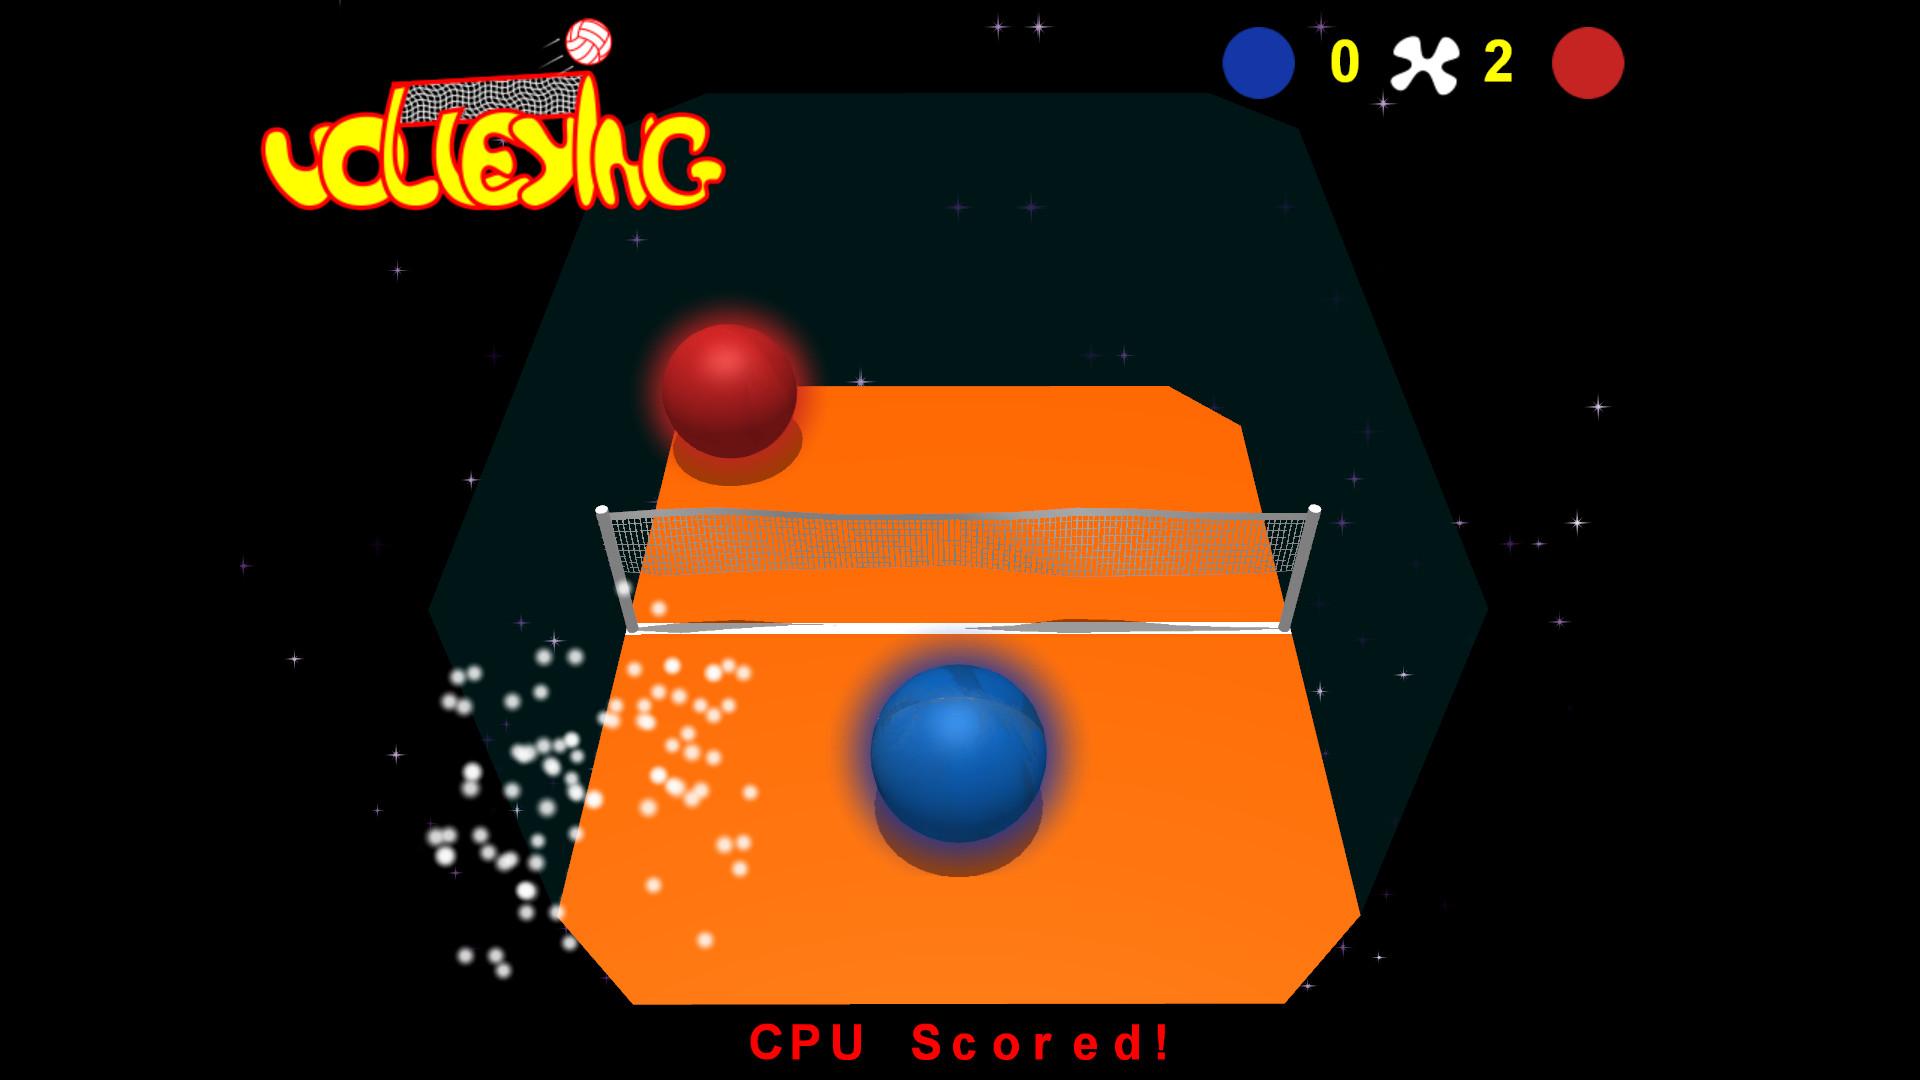 Volleying screenshot